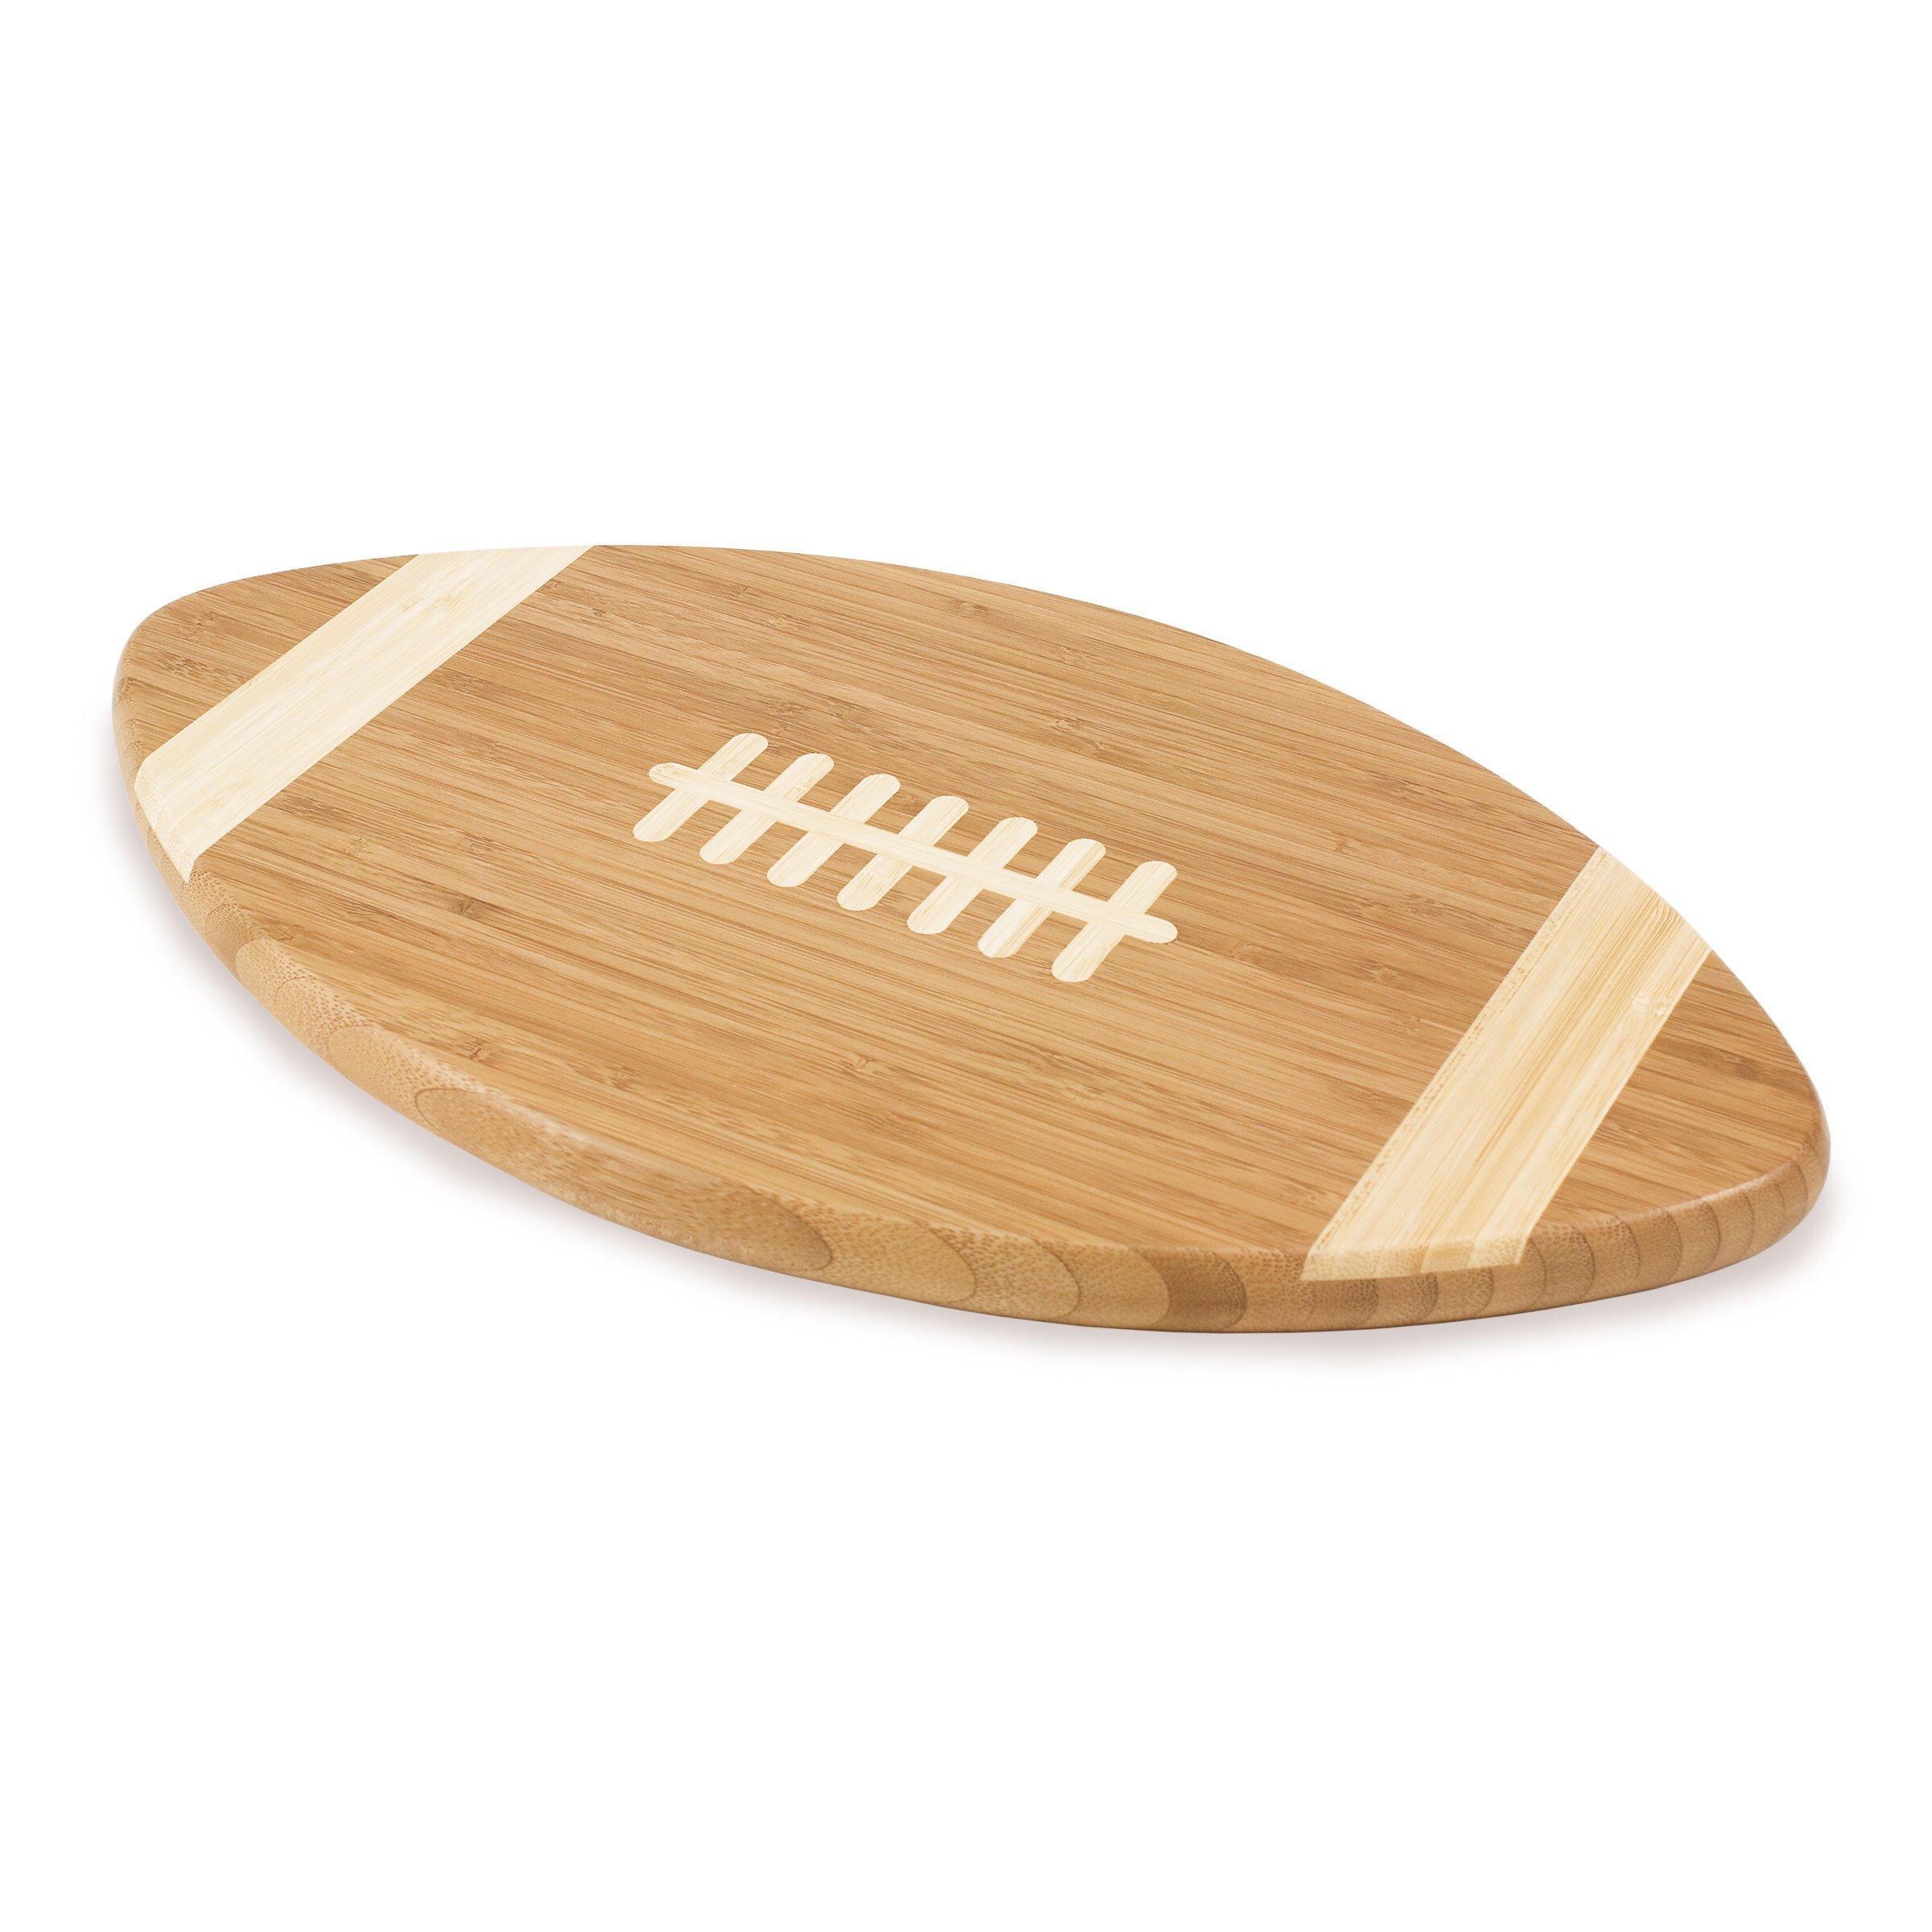 Football Bamboo Cutting Board